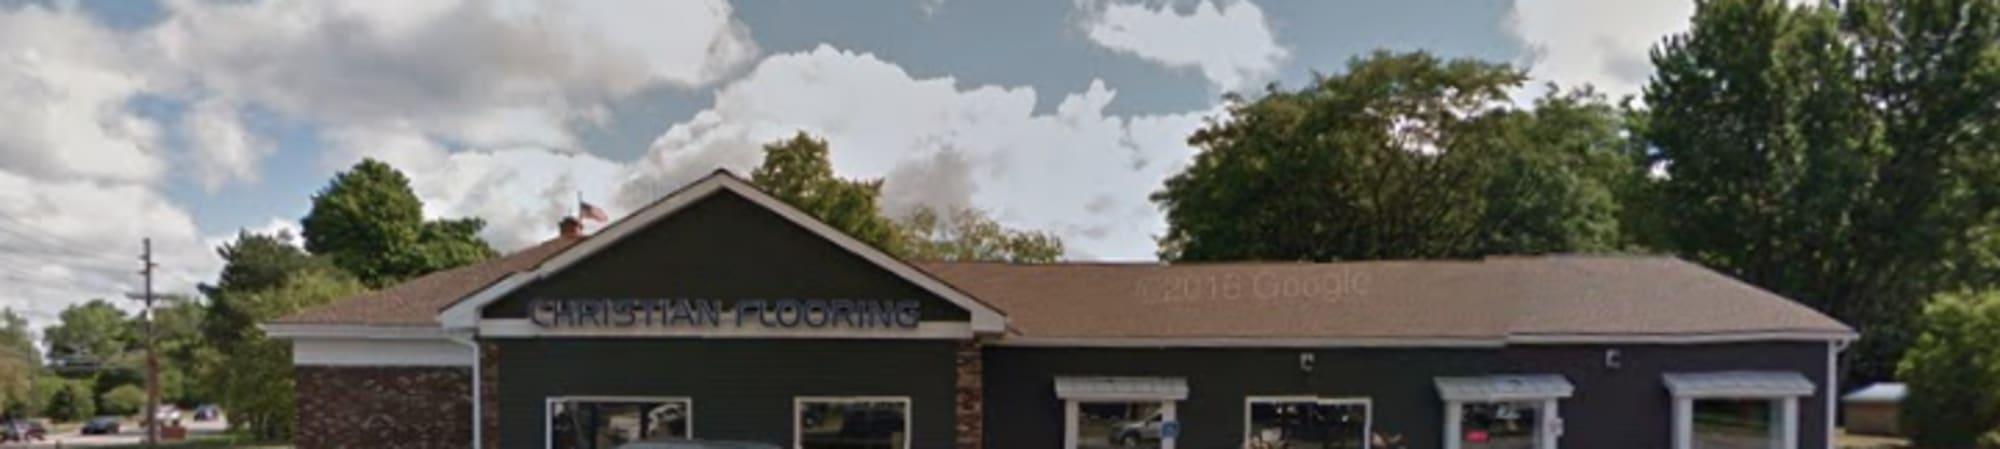 Christian Flooring - 827 Ridge Rd Webster, NY 14580